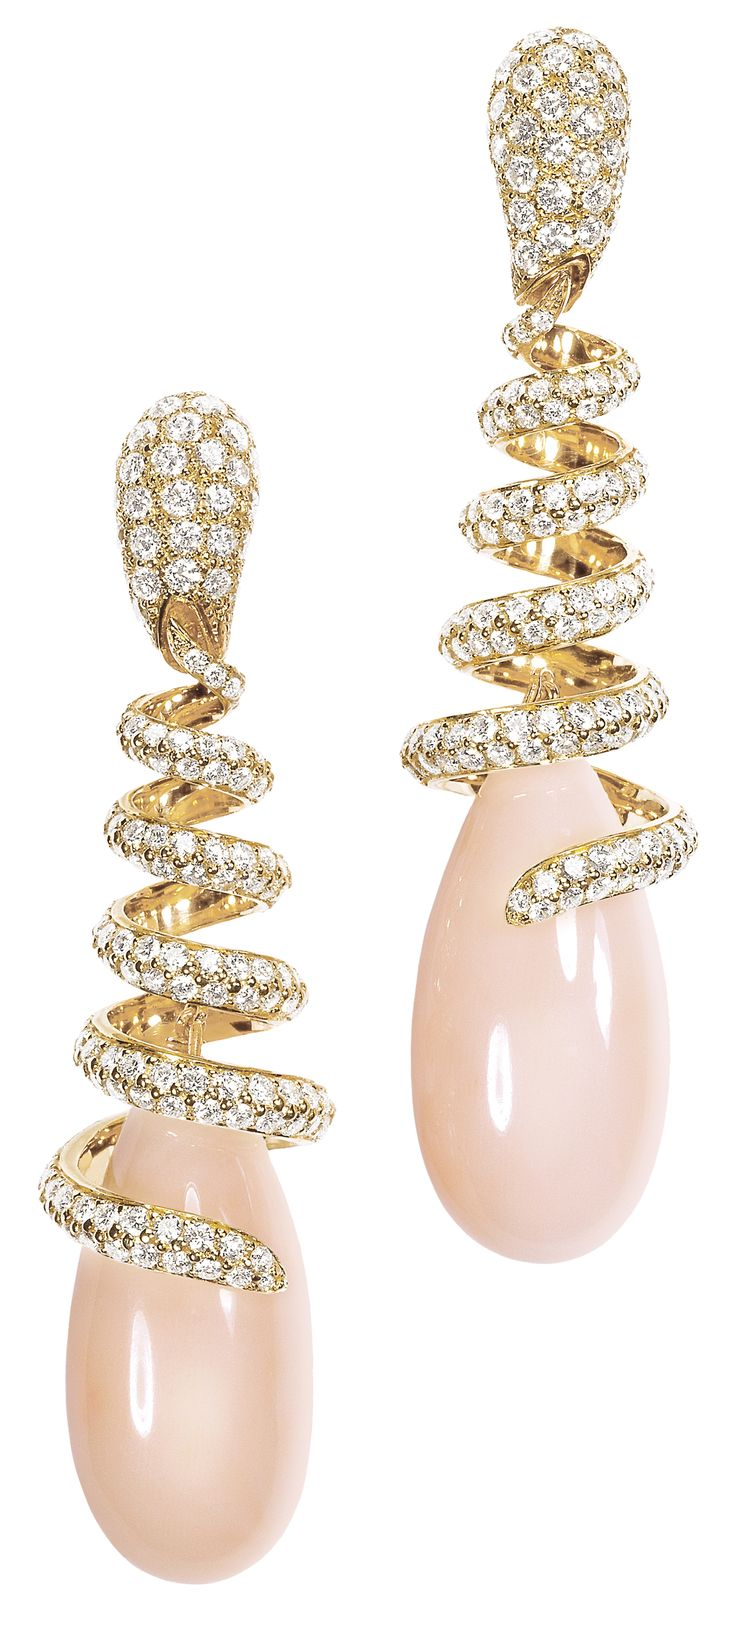 De Grisogono High Jewellery: coral and diamond drop earrings.